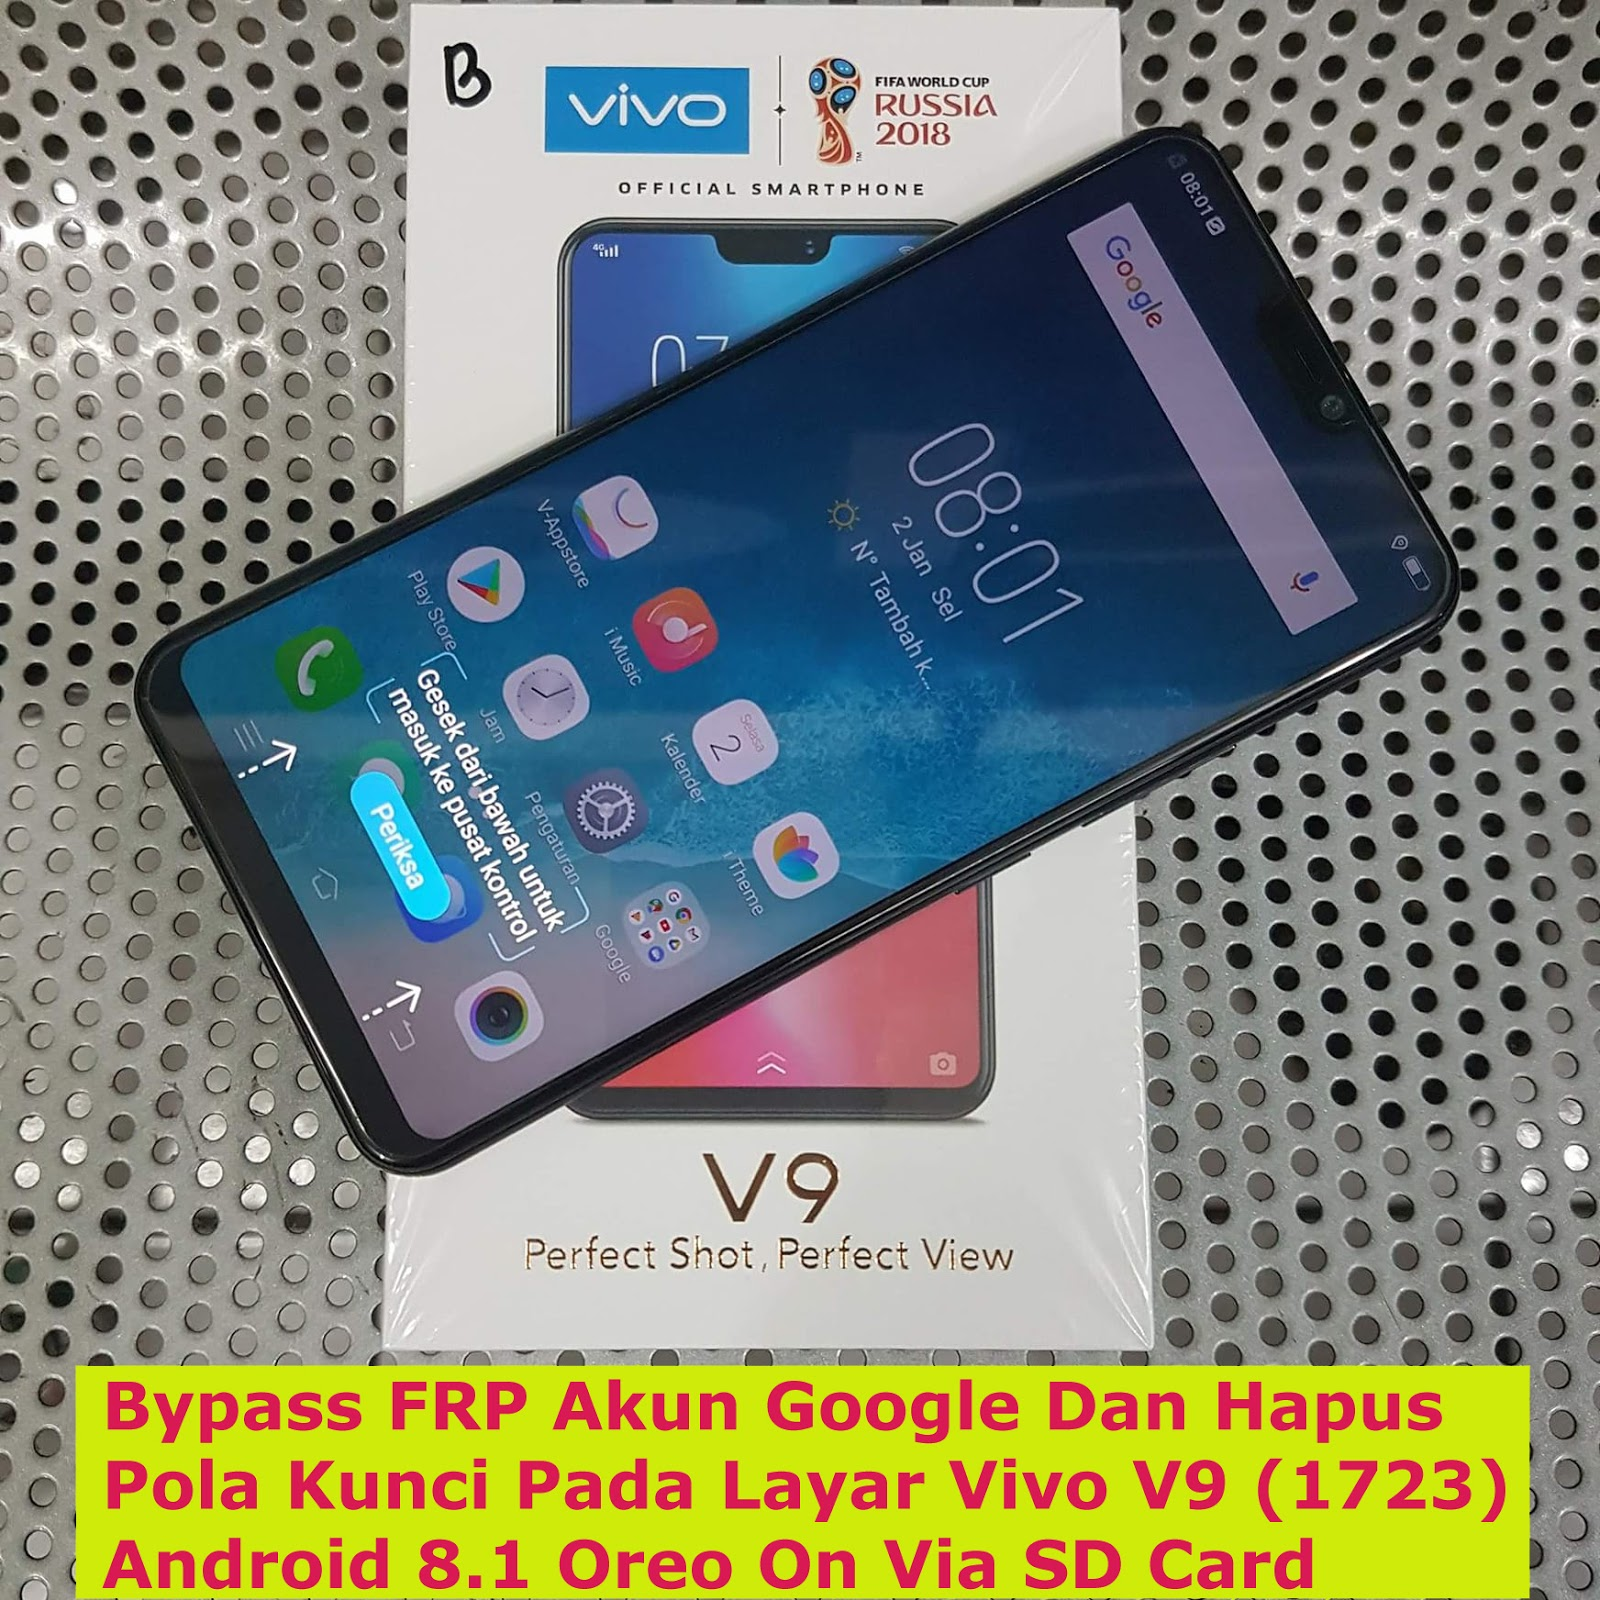 How To Unlock Vivo V9 Phone If Forgot Password ✓ The